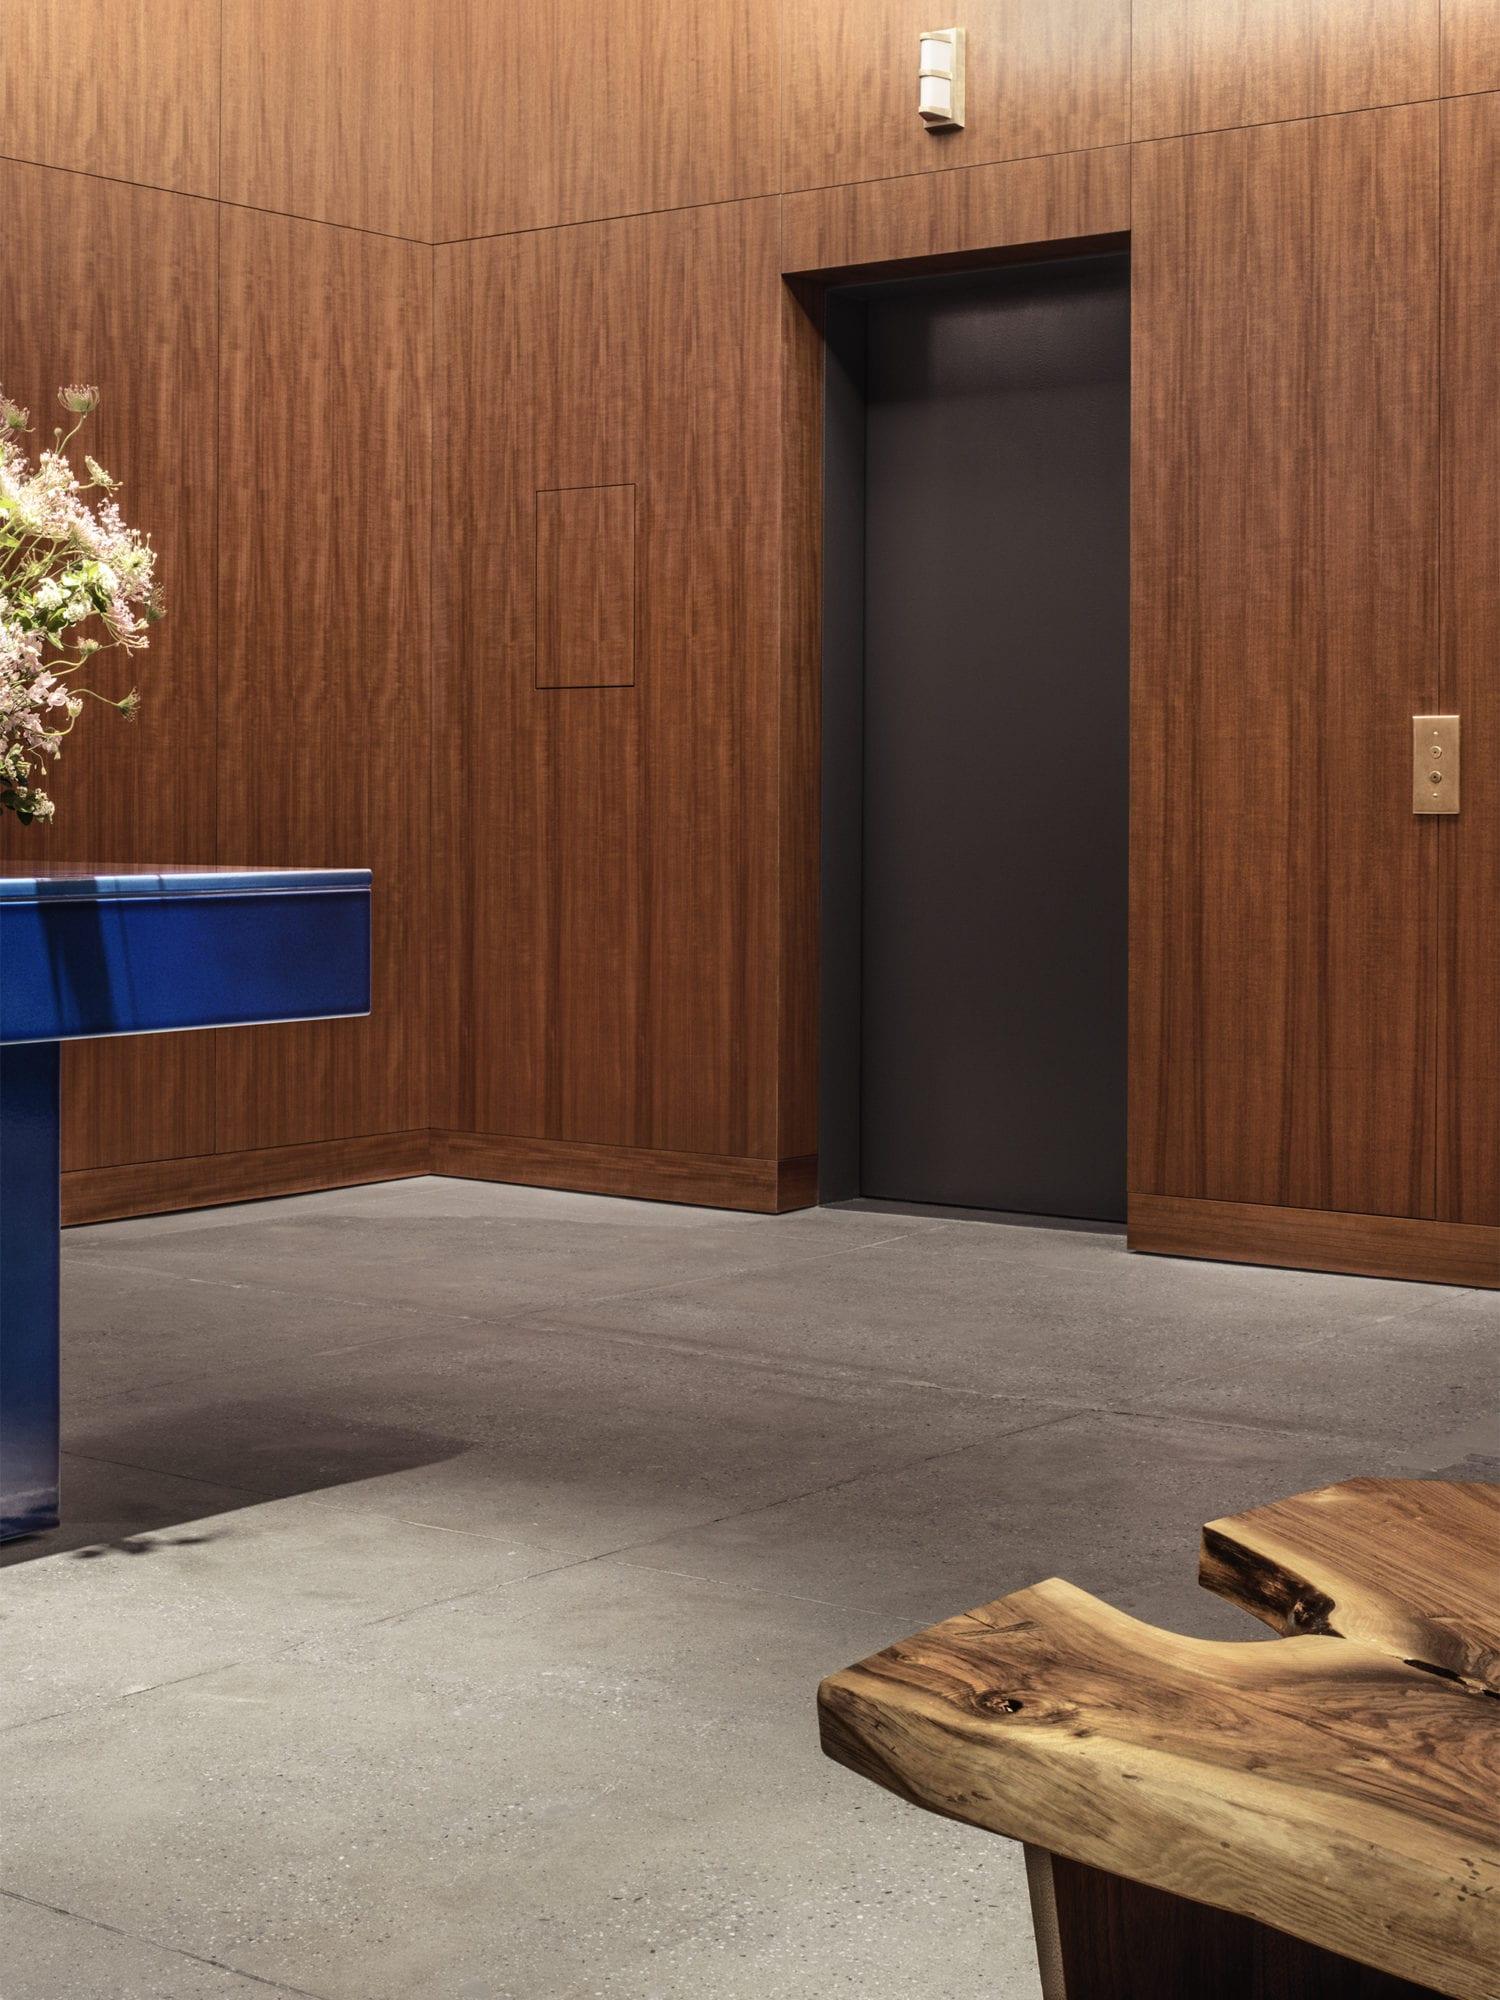 New York Office by Halleröd   Yellowtrace